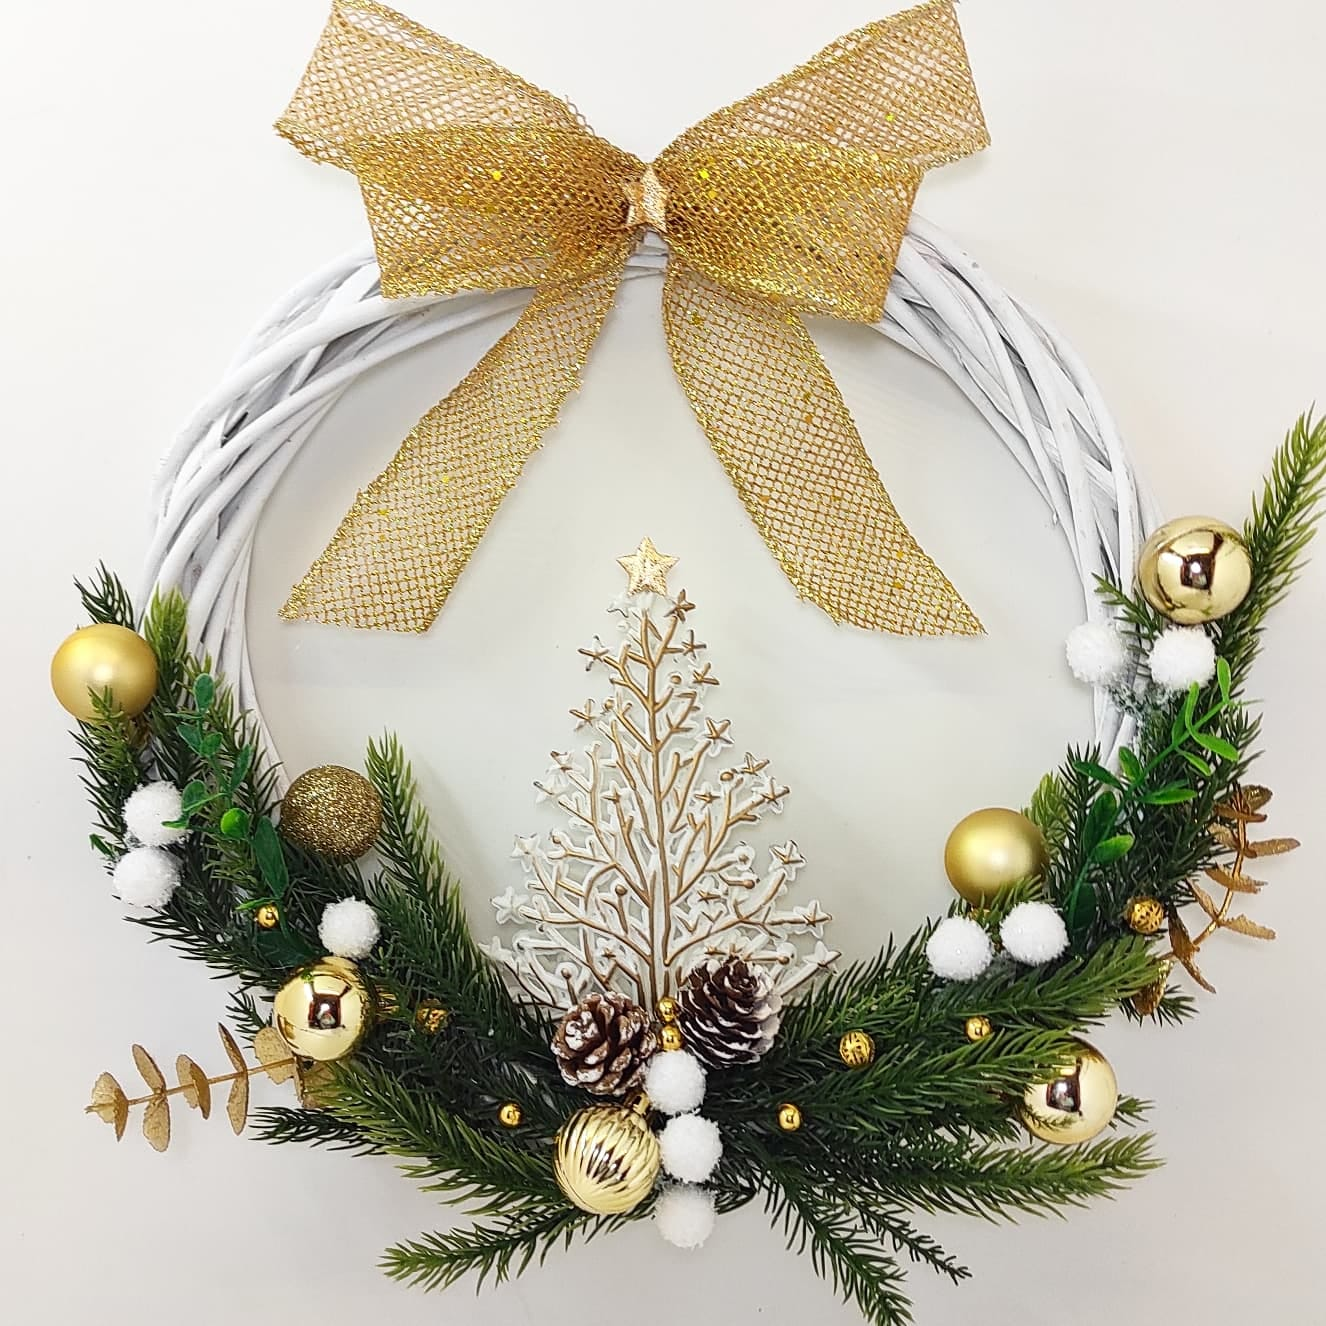 Guirlanda Natal Branca Rústica  Dourada